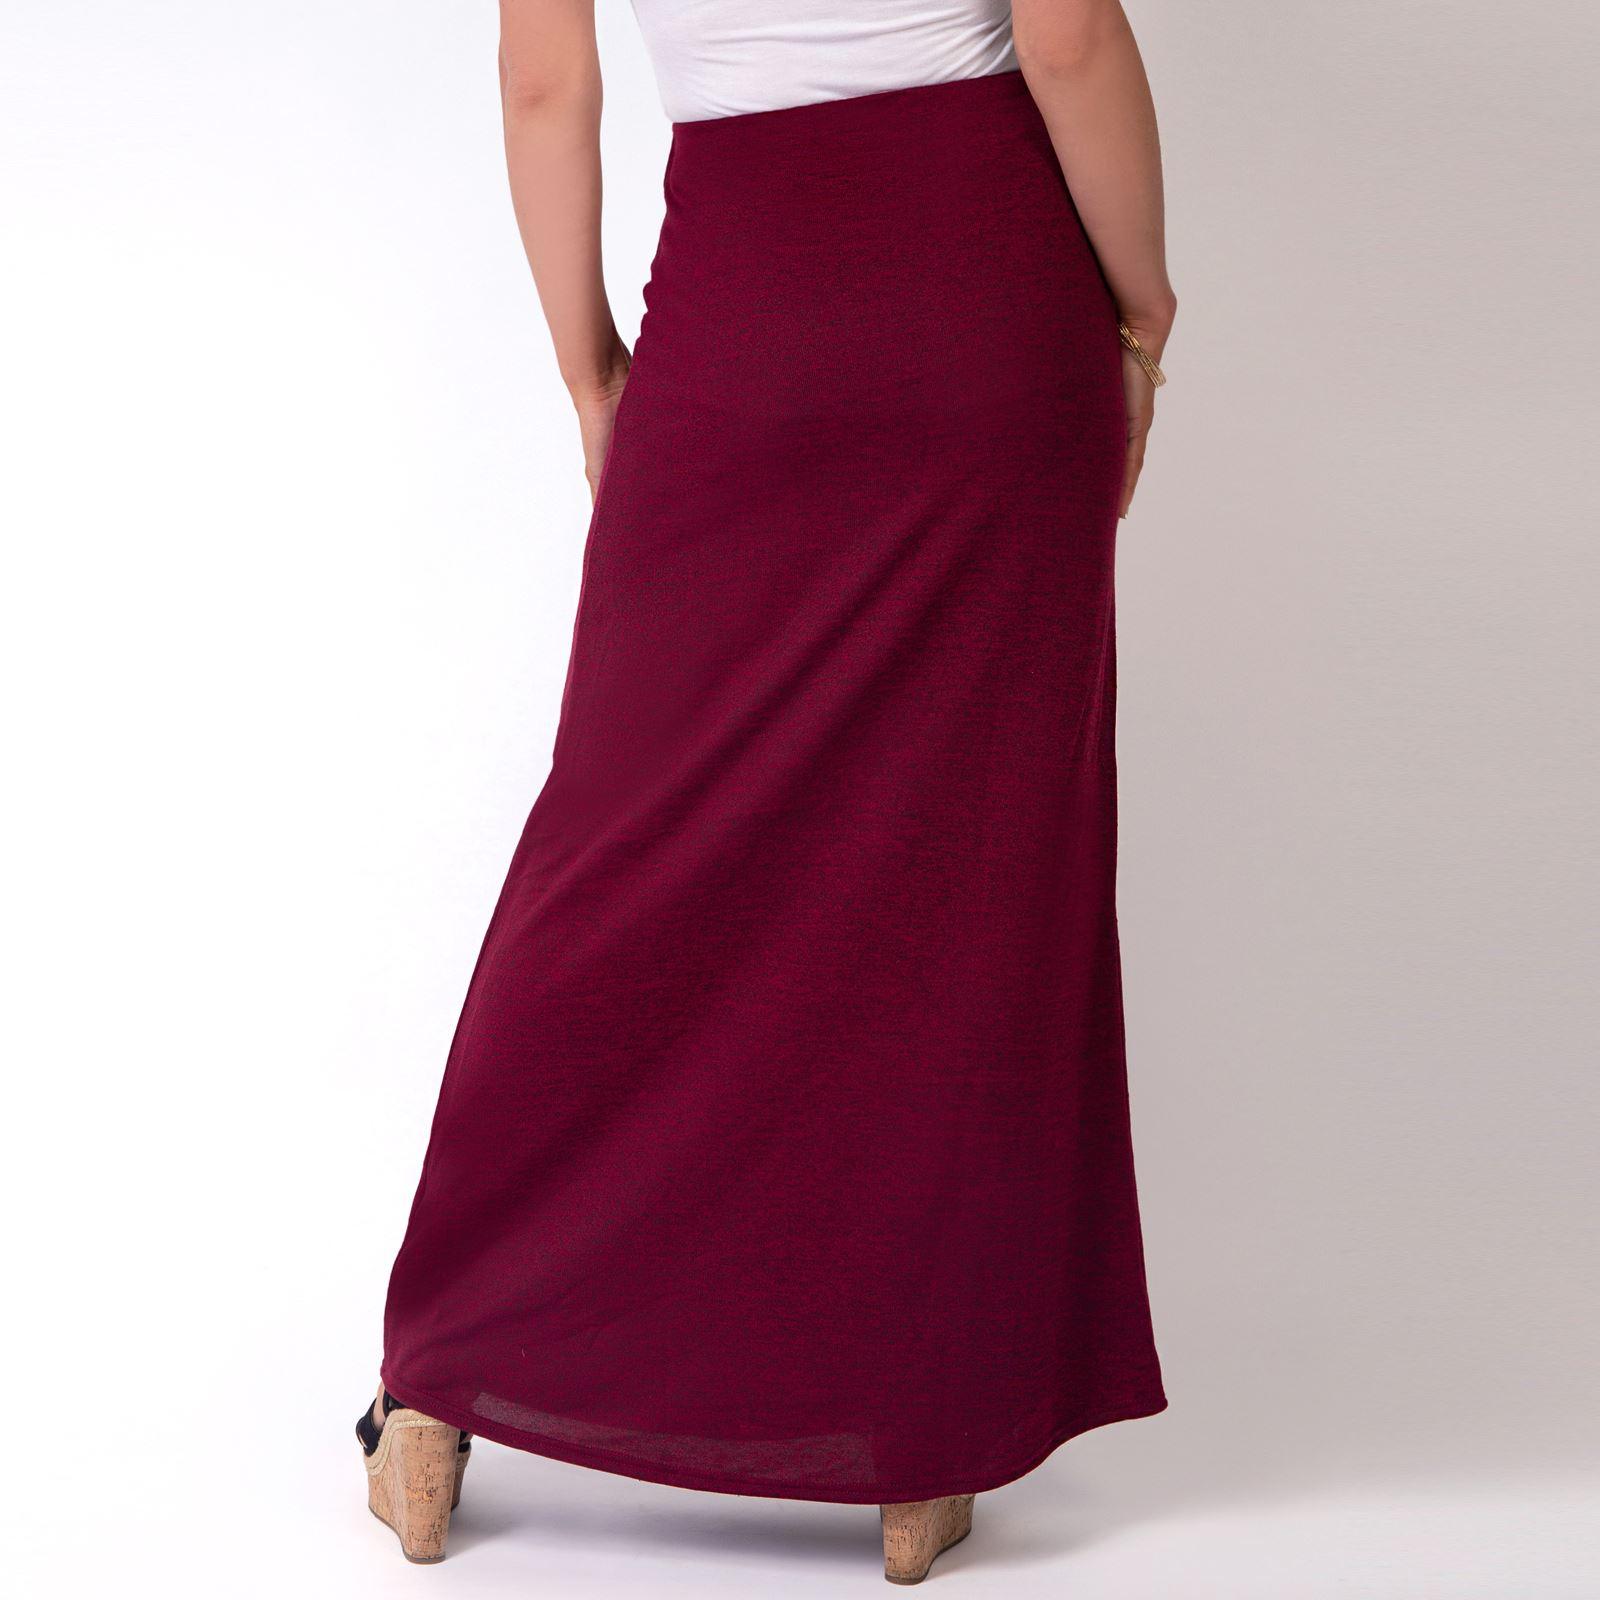 Womens-Ladies-Maxi-Skirt-High-Waist-A-Line-Long-Knit-Stretch-Bodycon-Casual-Boho thumbnail 17